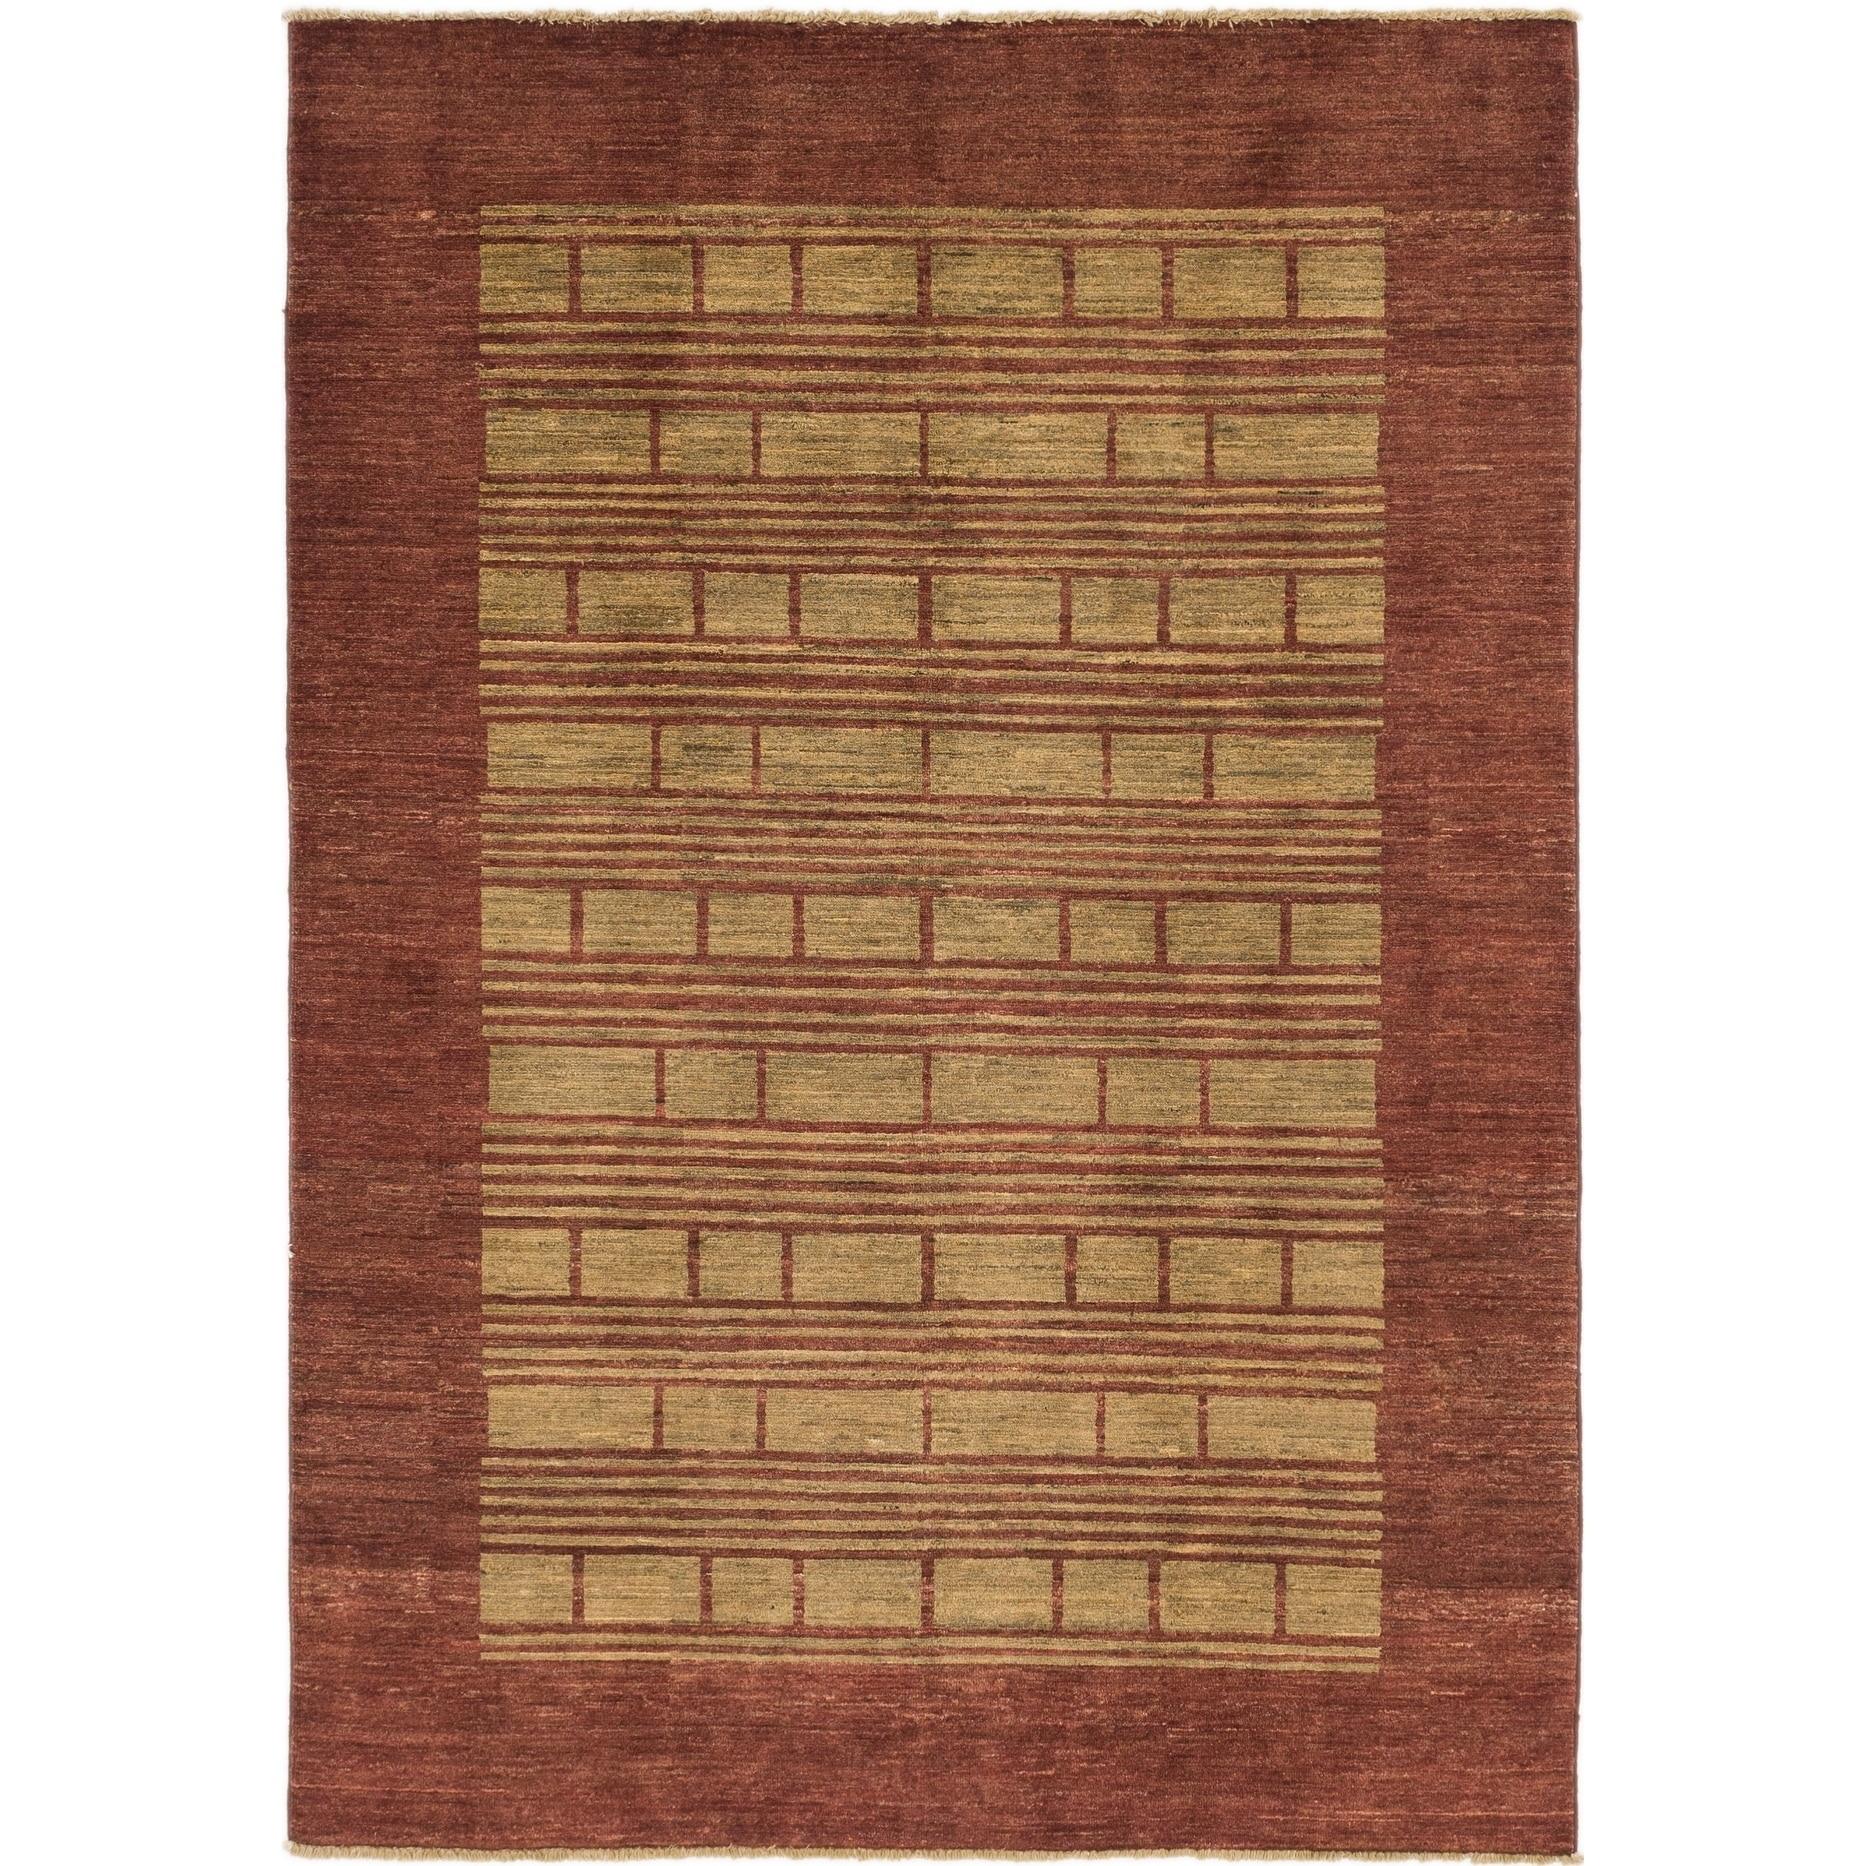 Hand Knotted Kashkuli Gabbeh Wool Area Rug - 5 6 x 7 10 (Burgundy - 5 6 x 7 10)